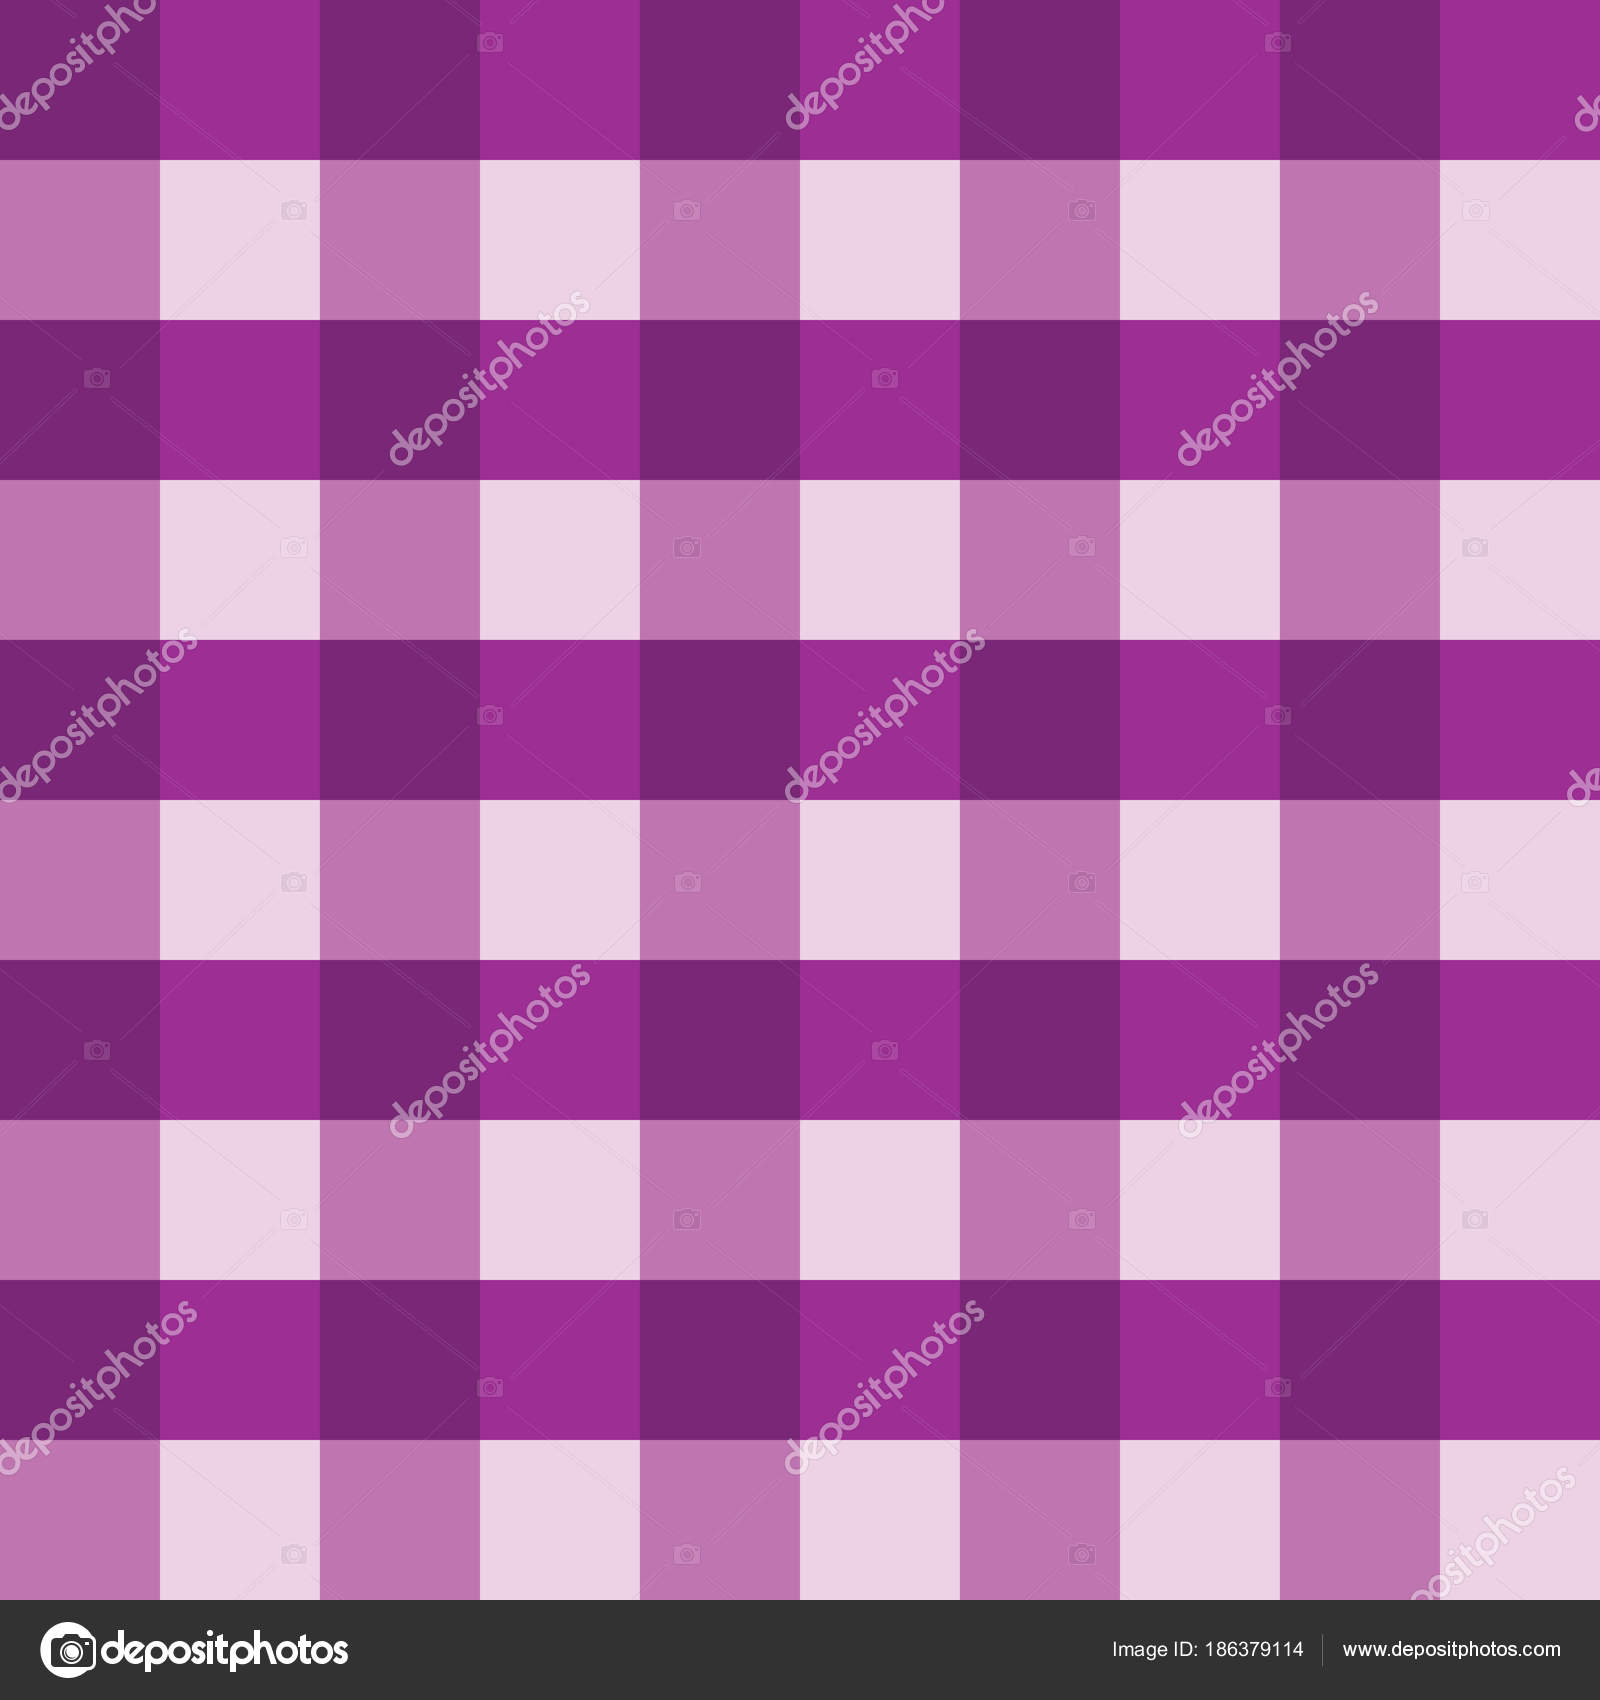 786f19b1841 Σχεδιασμός Πατρόν μοβ καρό απρόσκοπτη διάνυσμα φόντο. Υφή από ρόμβος ή  τετράγωνα για καρό, τραπεζομάντιλα, ρούχα, μπλούζες, φορέματα, χαρτί και  άλλα ...